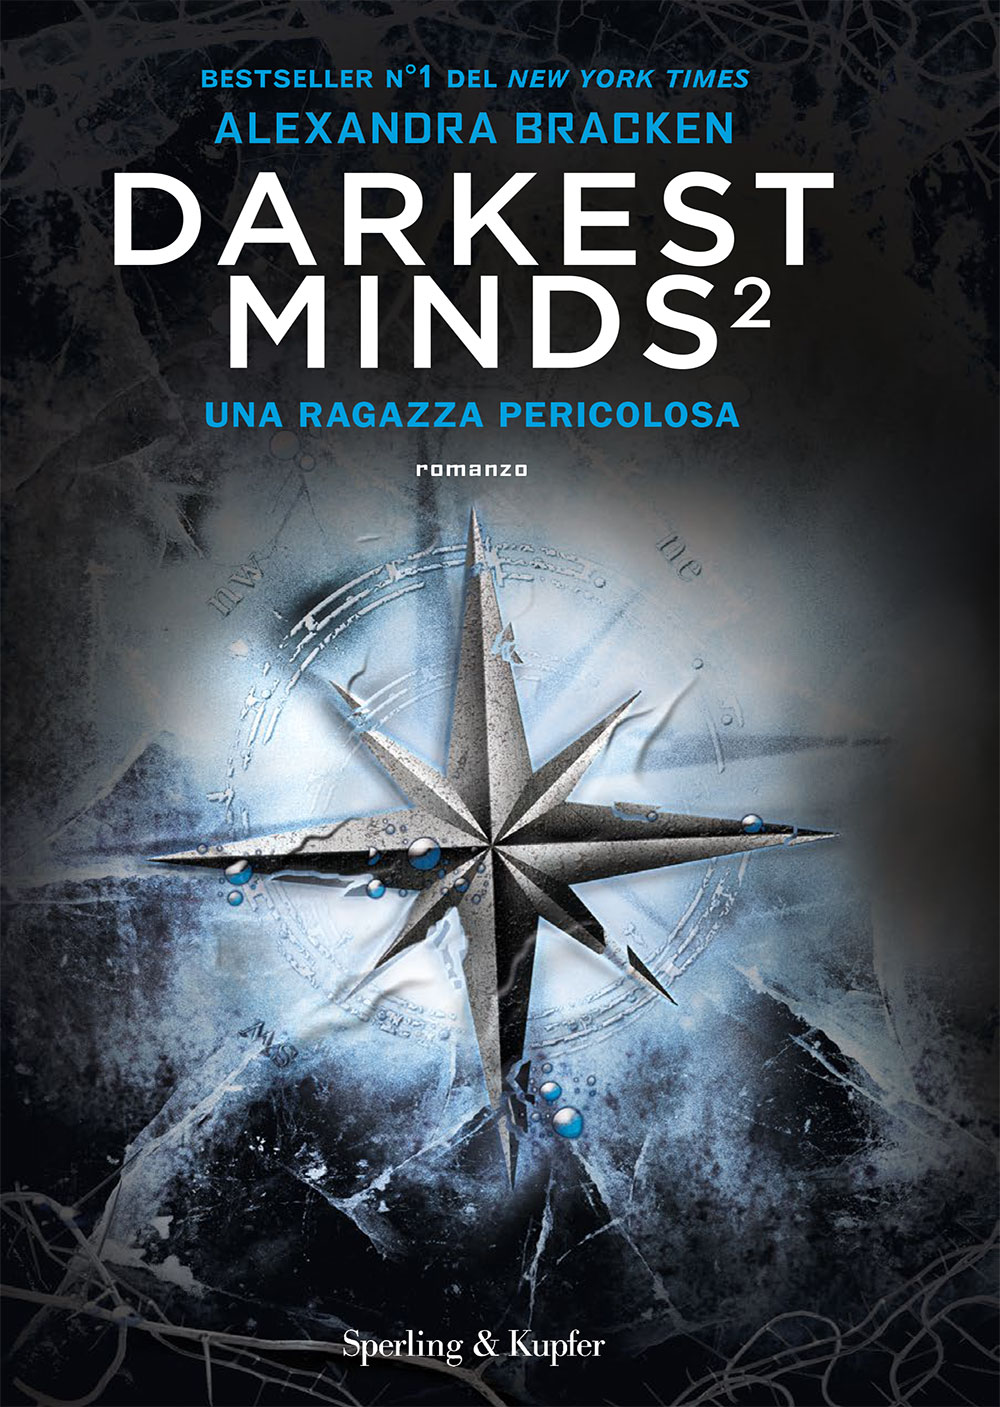 Darkest minds 2. Una ragazza pericolosa